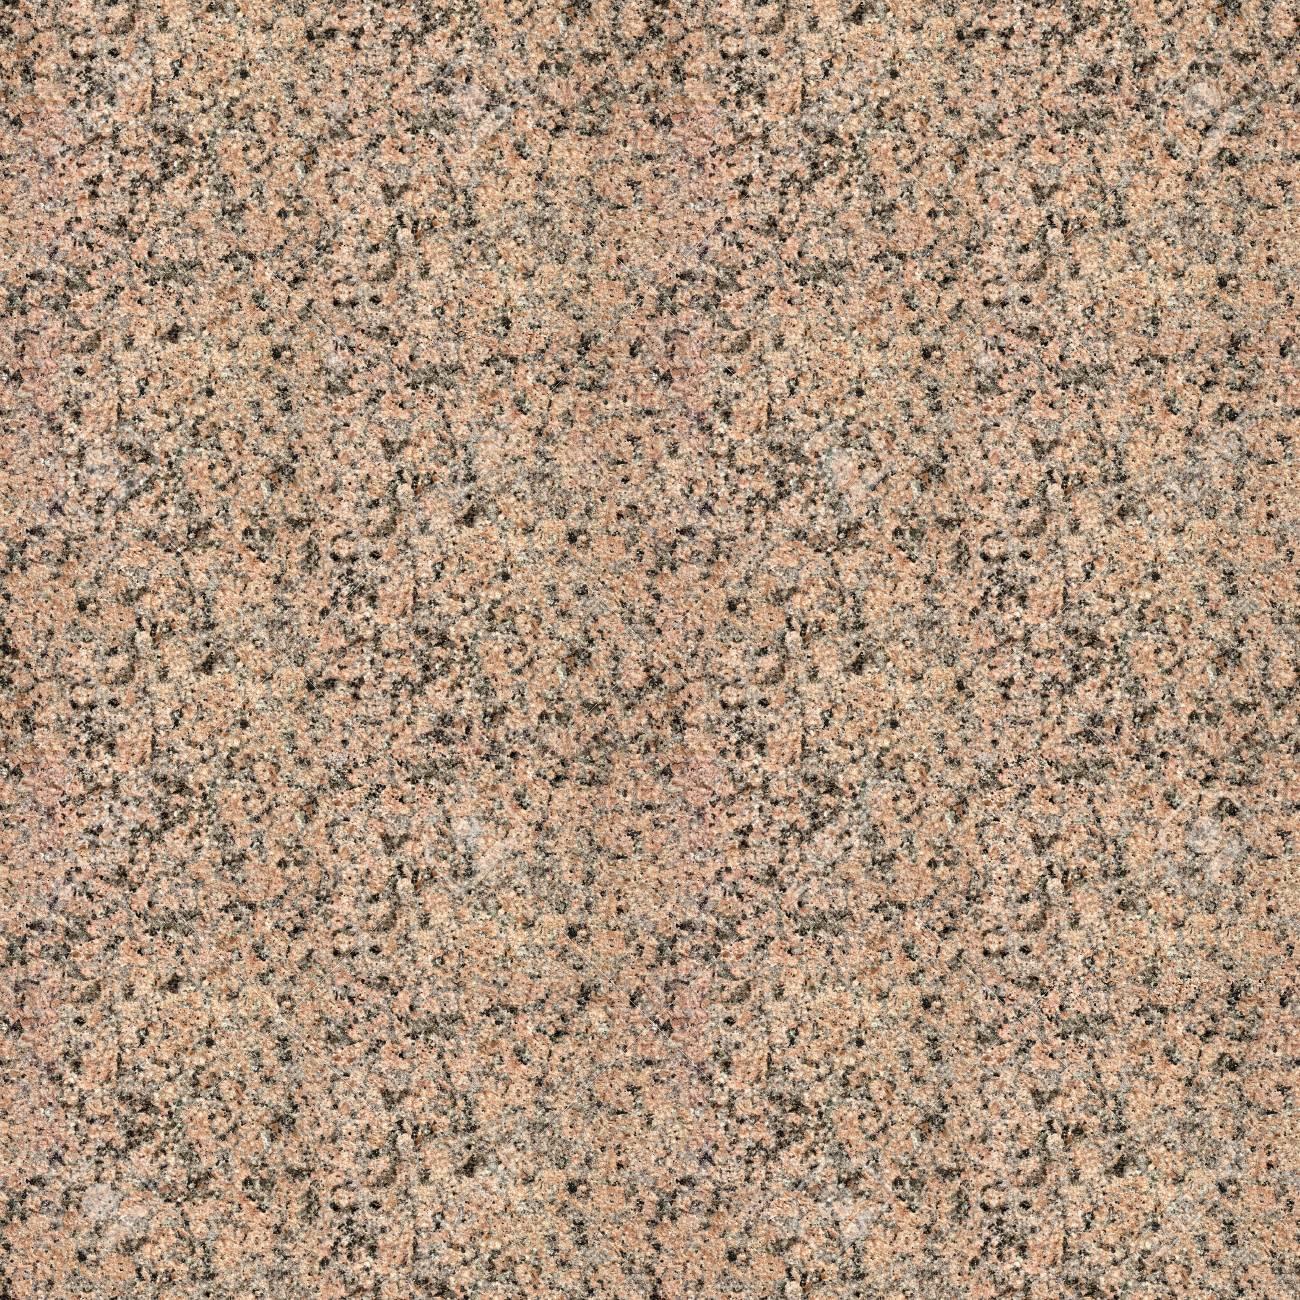 . Seamless Granite Stone Smooth Surface Texture  Hard Granite Block